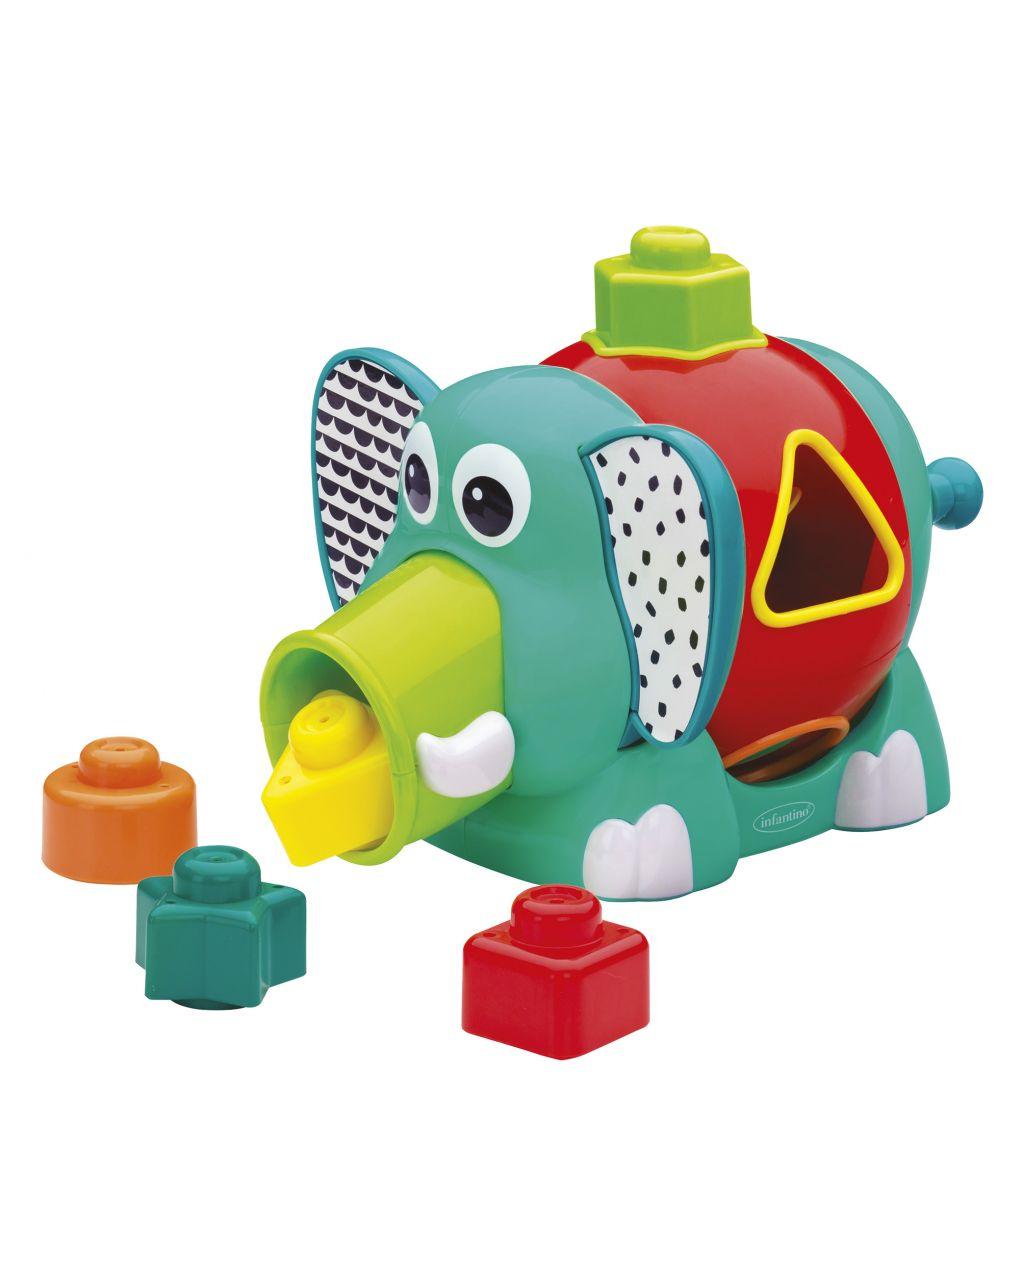 Bkids - elefante multijogador - B-kids